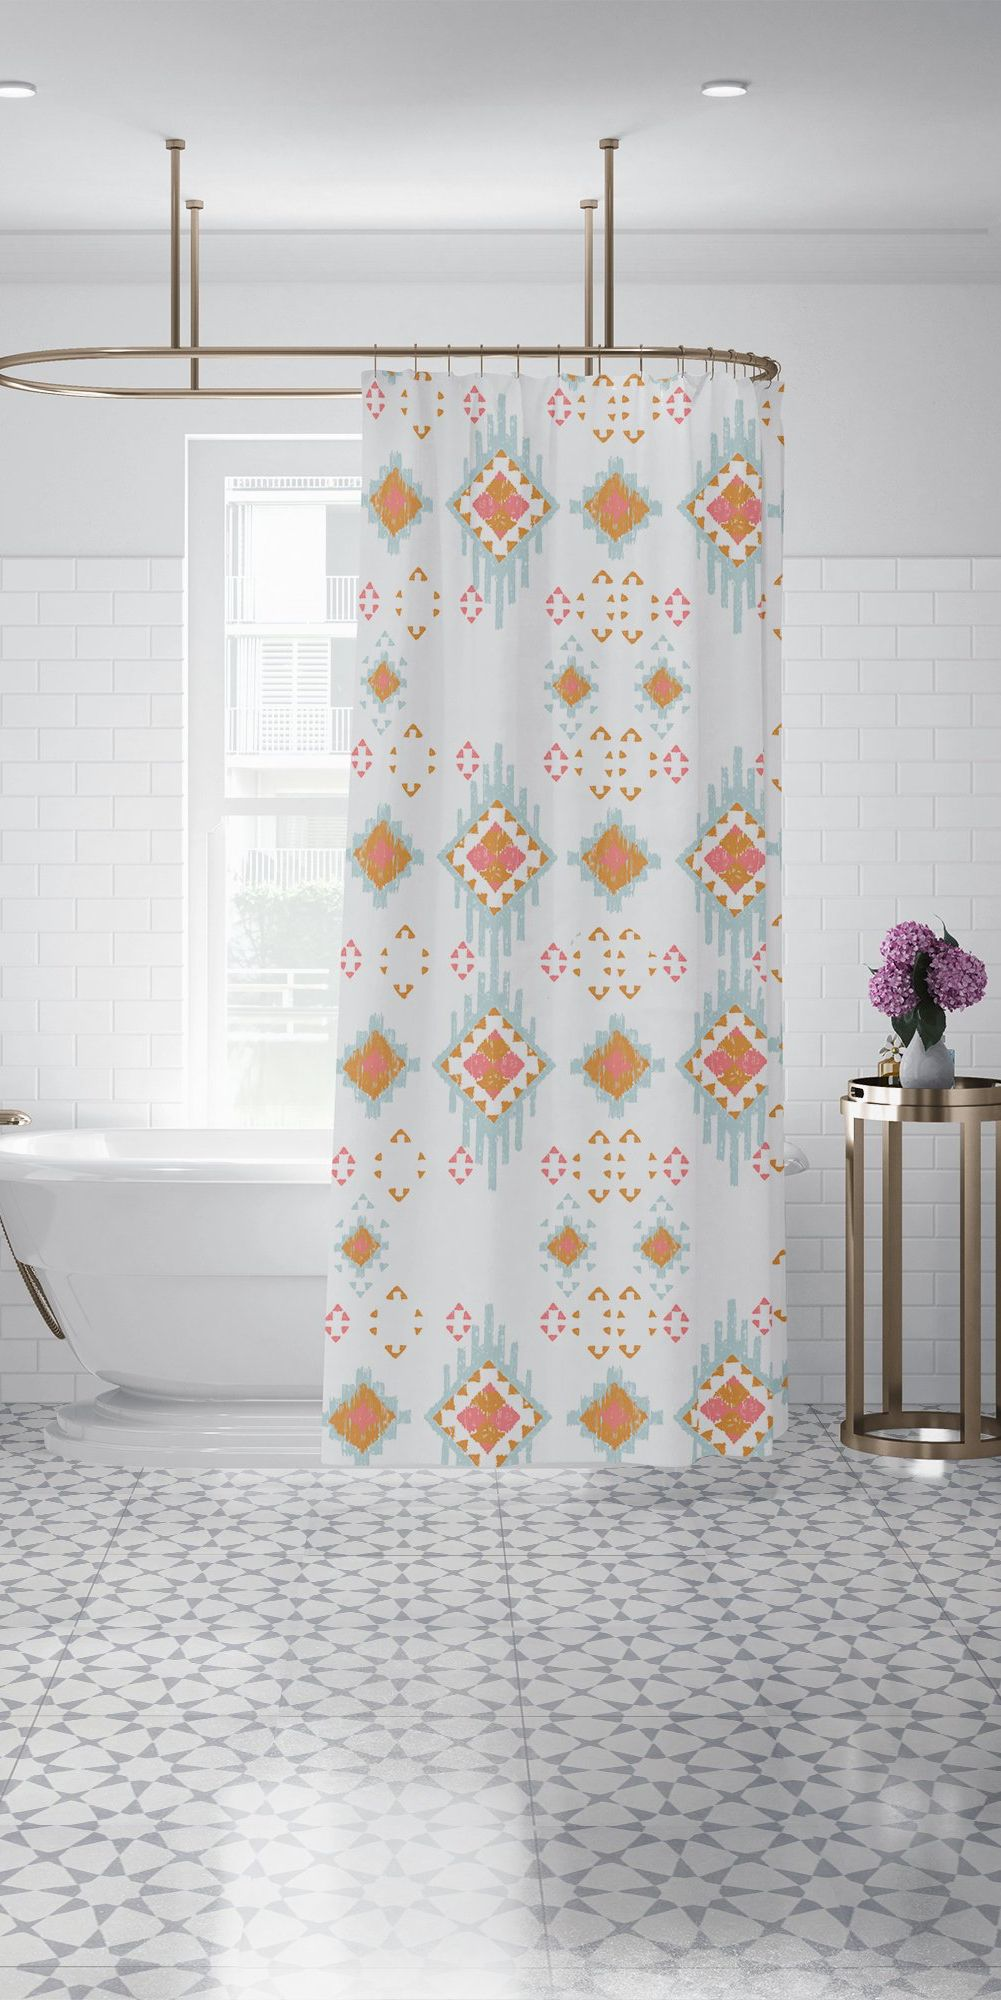 Bohemian Ikat Copper Pink Blue Shower Curtain Geometric Triangle Fabric Bathroom Curtain 70x70 83x70 90x70 Custom Shower Curtains Blue Shower Curtains Custom Shower